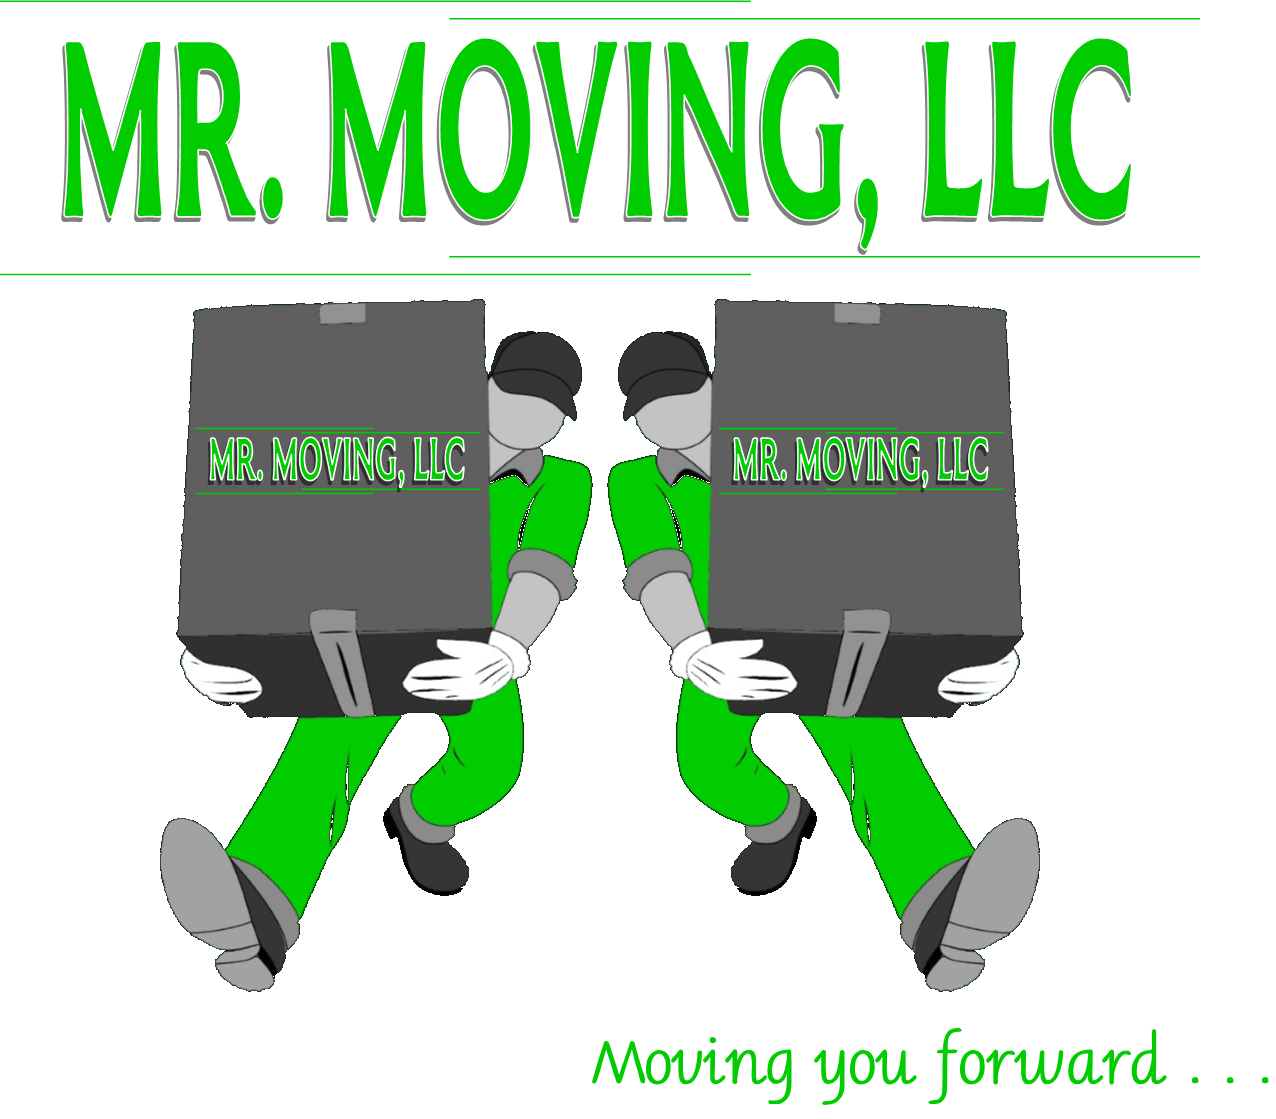 MR. MOVING LLC